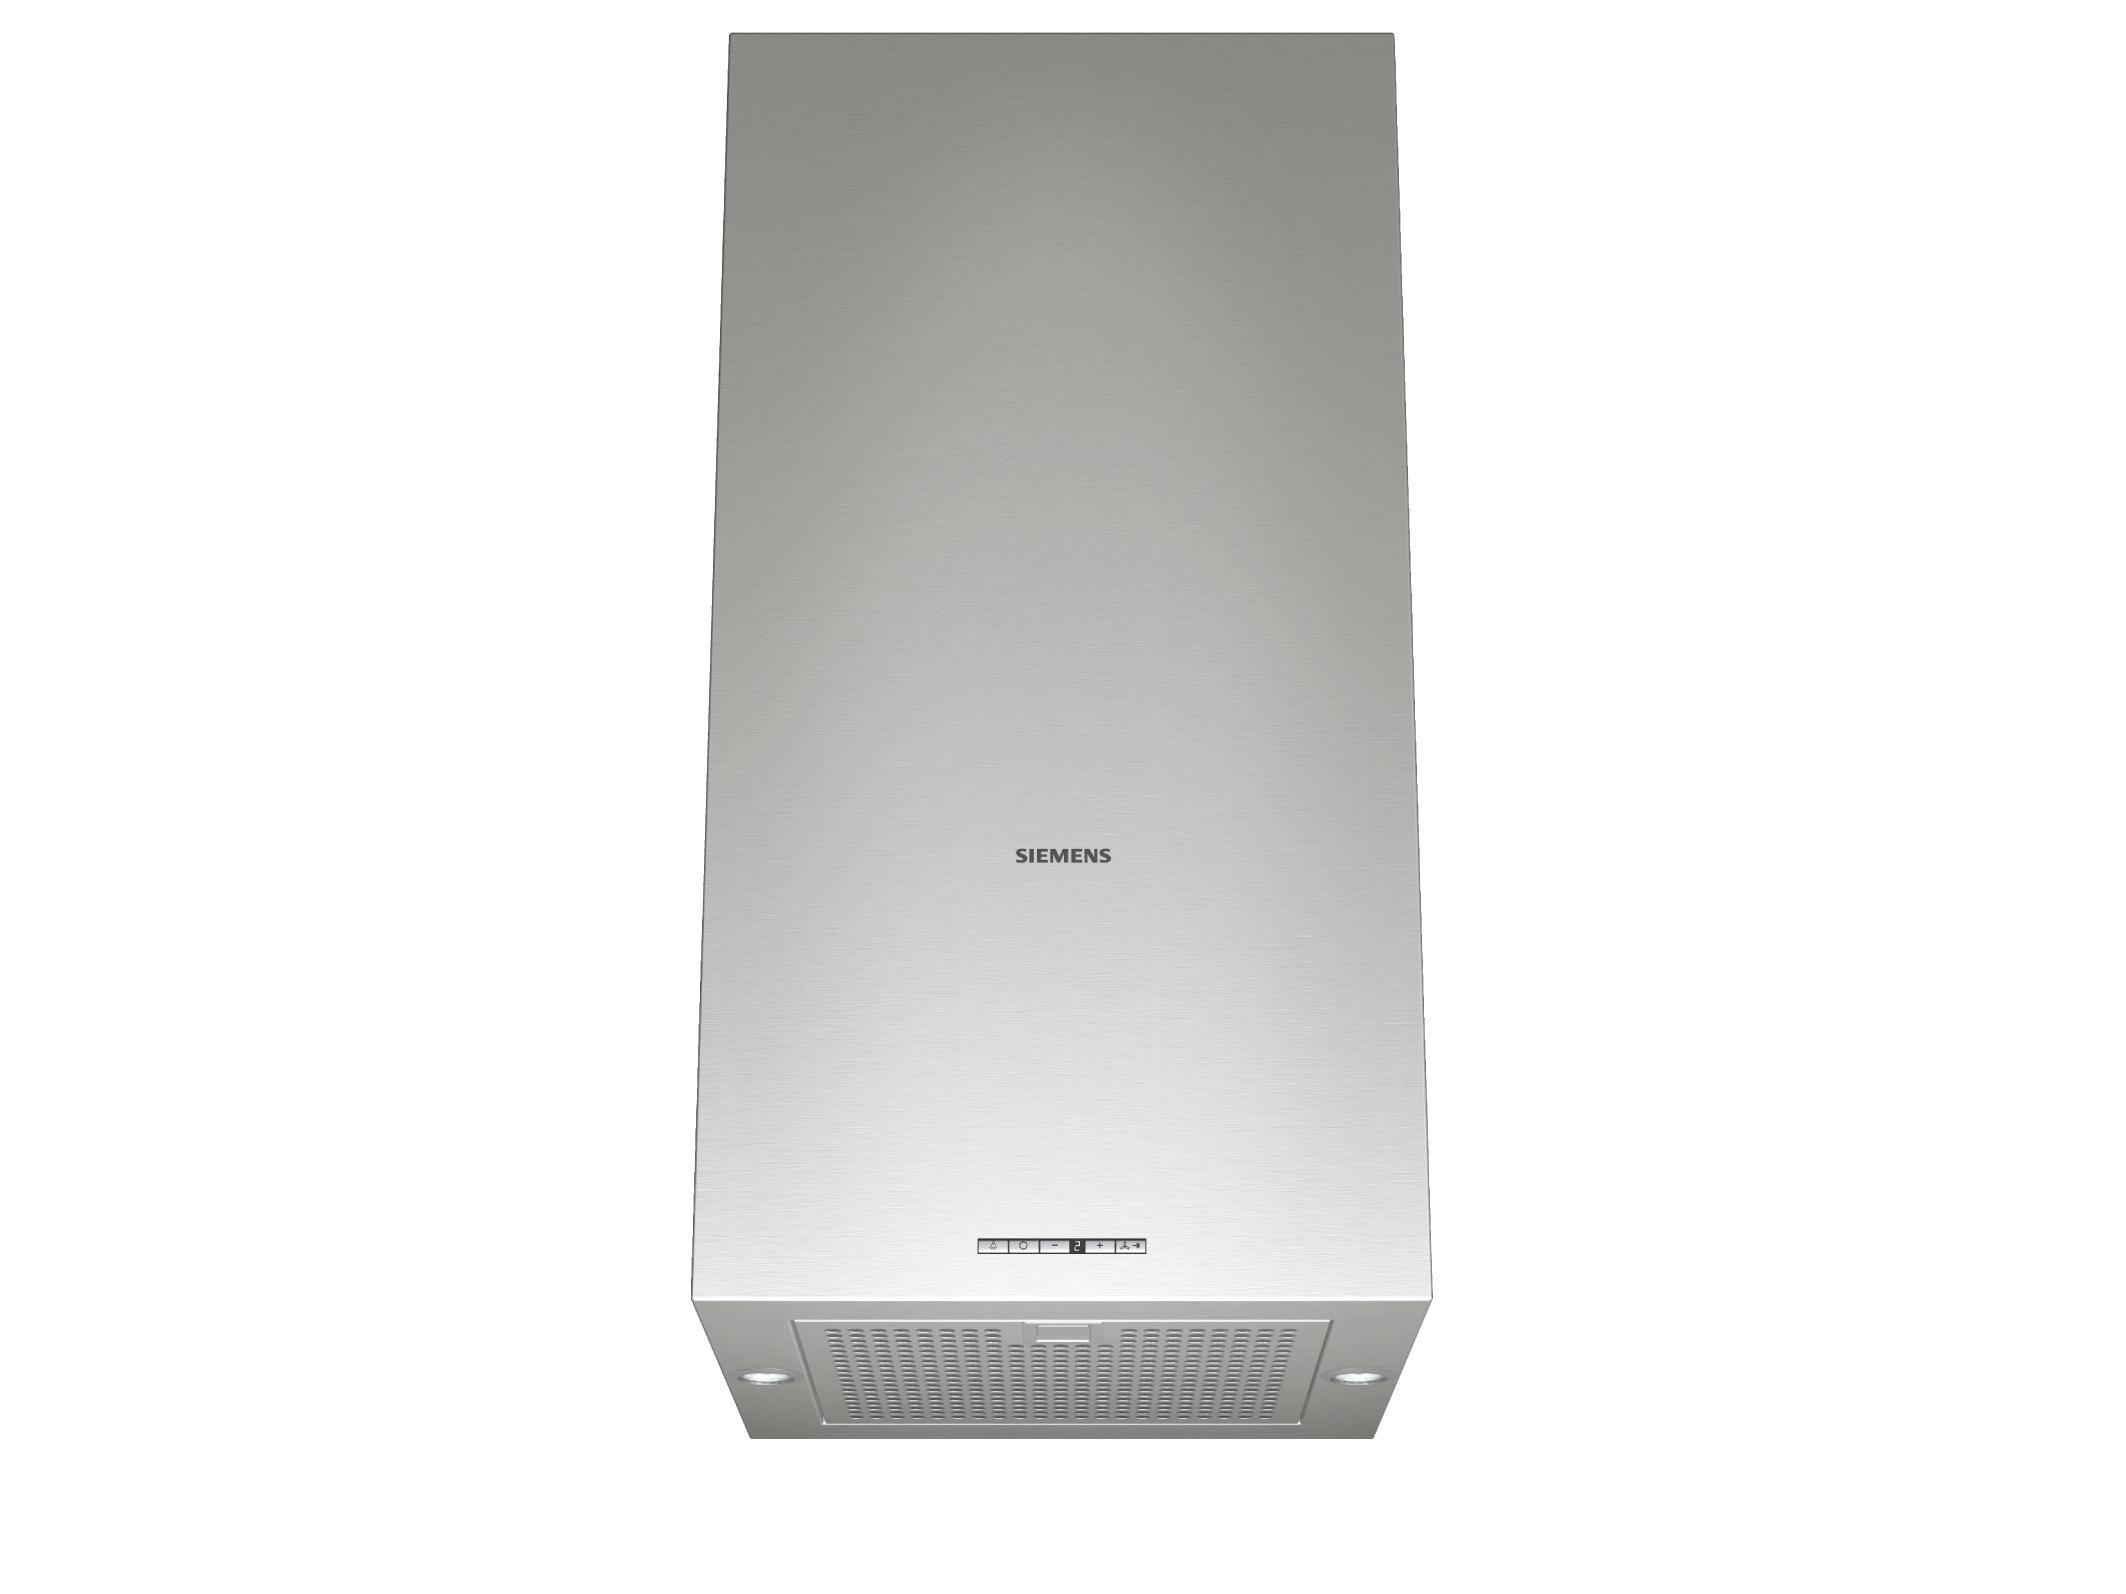 Dunstabzugshaube Siemens Lf457ca60, EEZ B - ROMANTIK / LANDHAUS, Metall (40/78-120/40cm) - SIEMENS